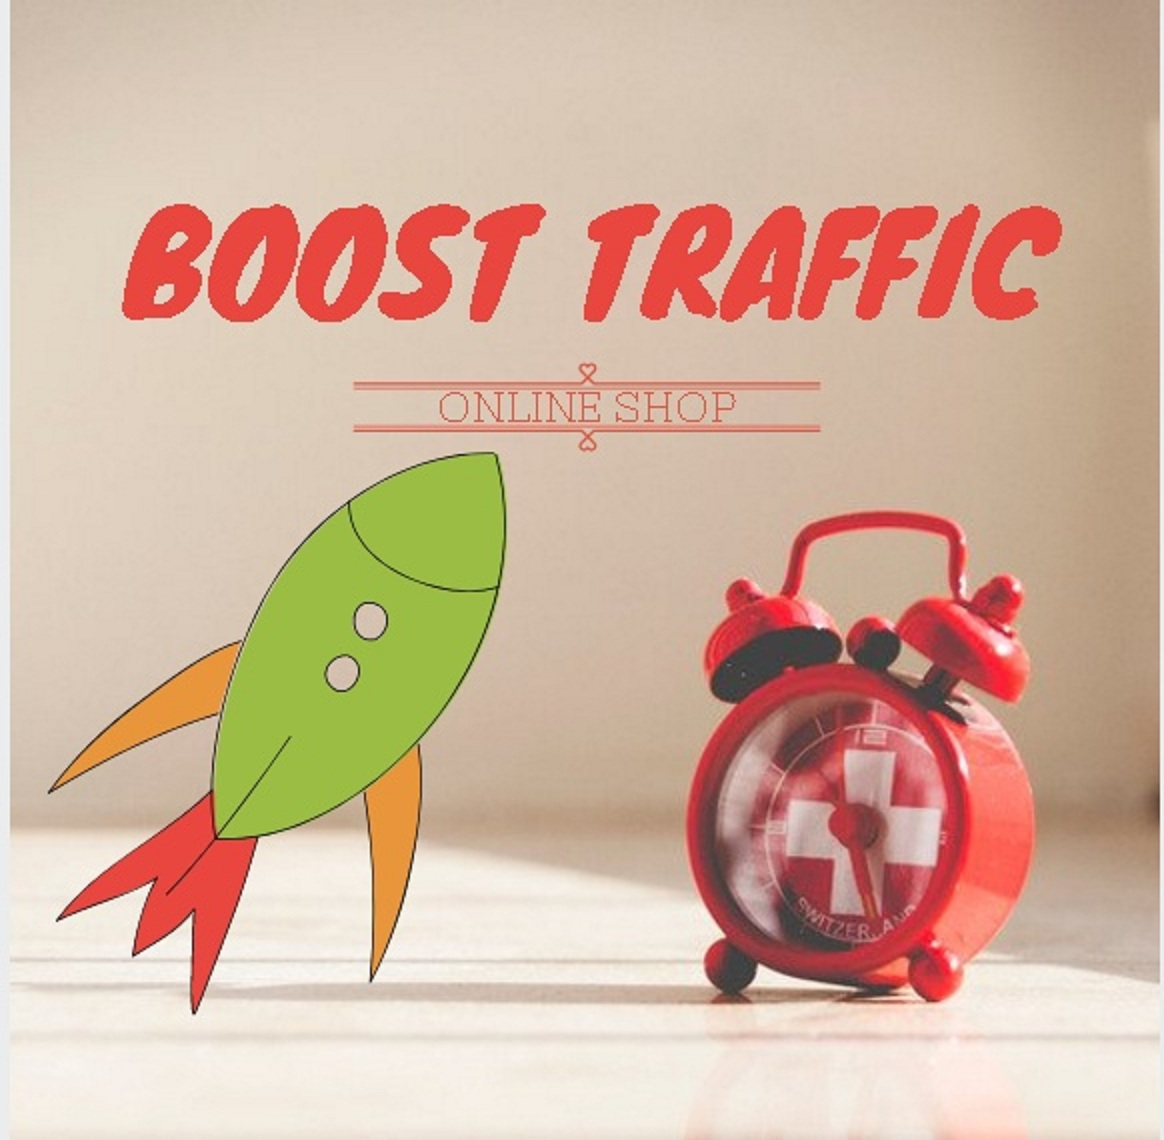 boost Quality SEO Traffic to alibaba shopify Etsy Ebay Amazon ecommerce shop listing Product